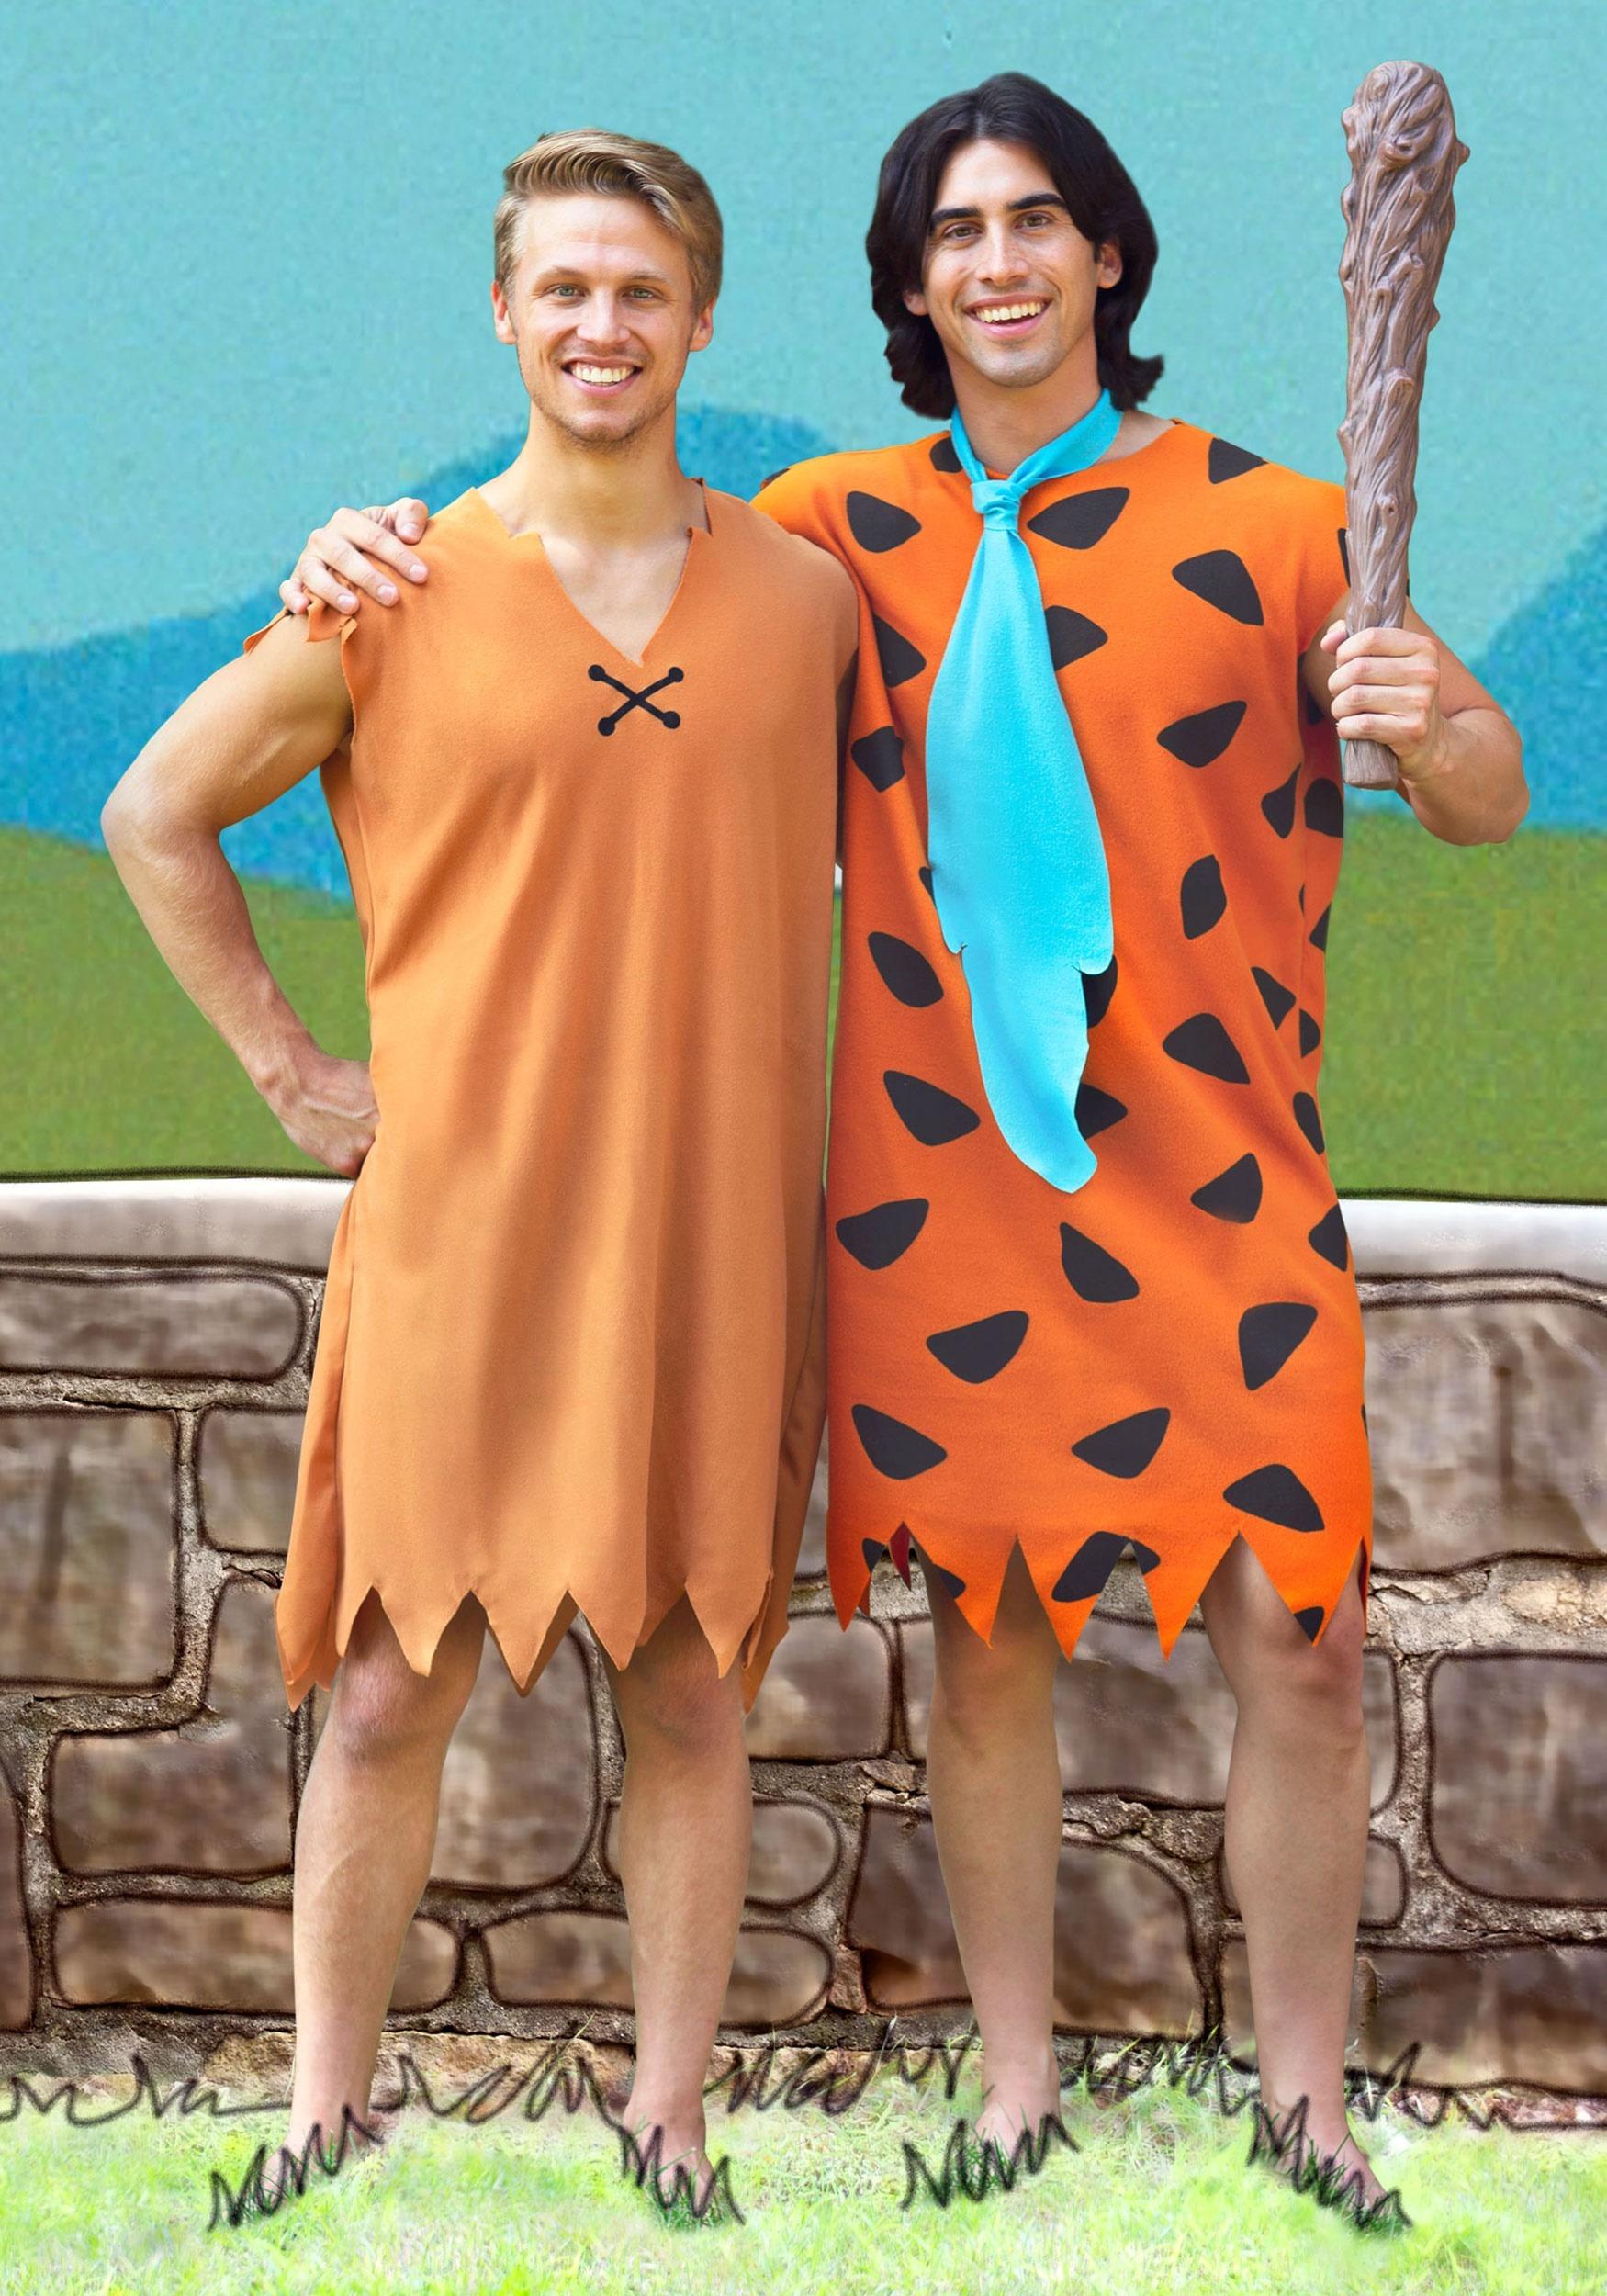 The Flintstones Classic Barney Rubble Adult Costume